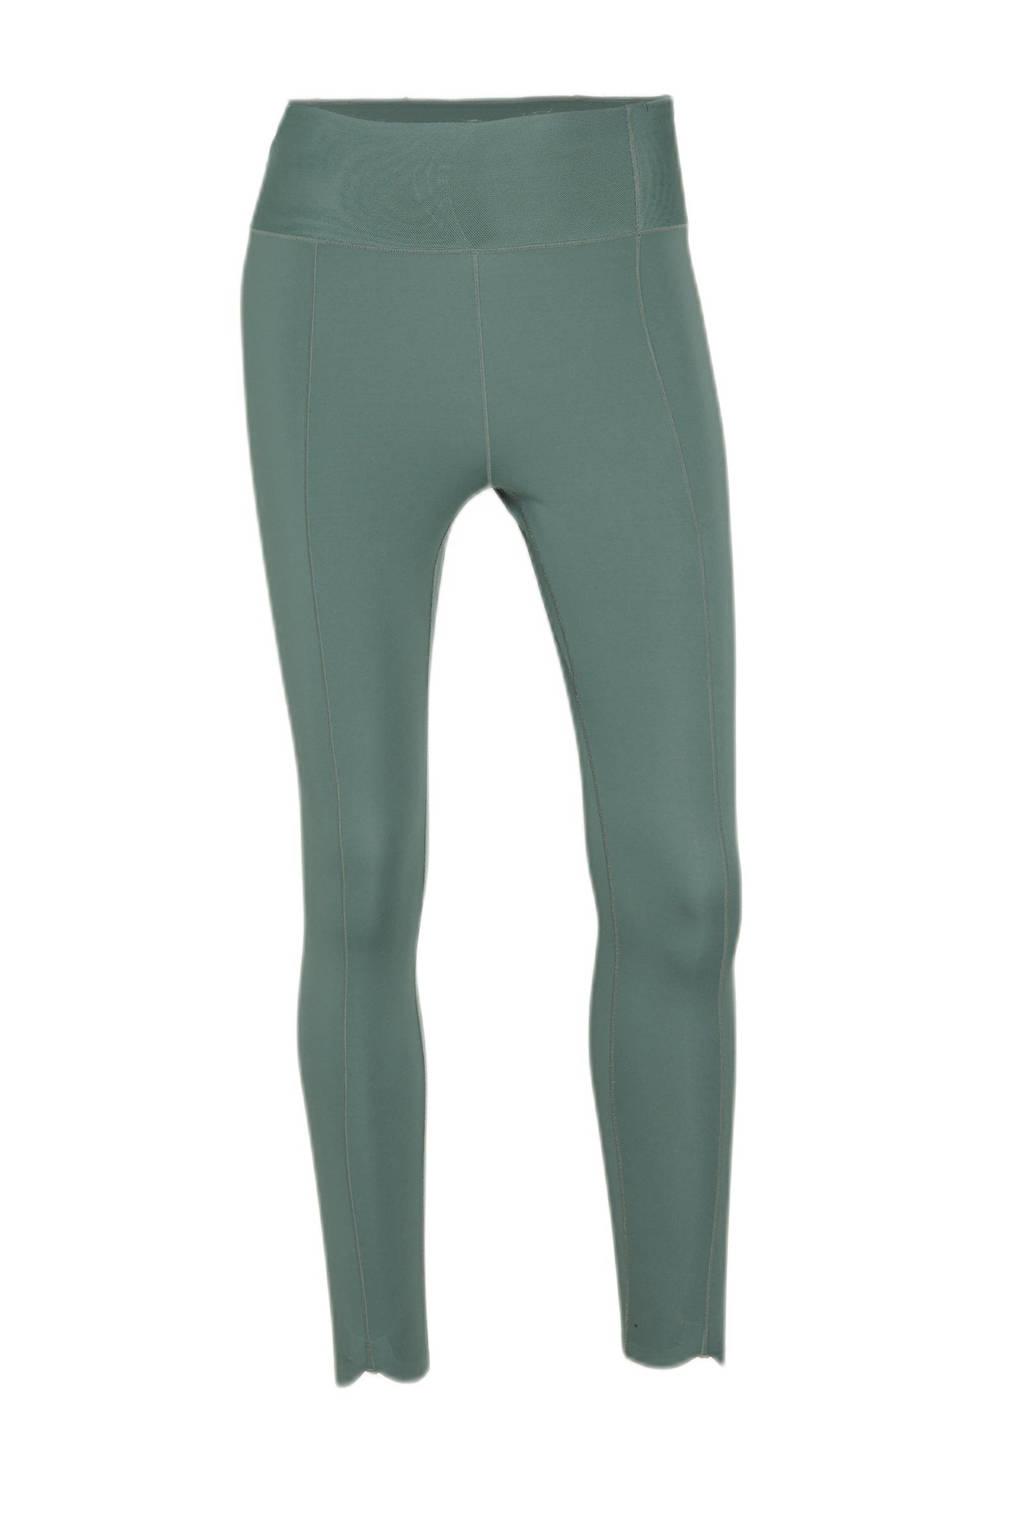 Nike 7/8 sportlegging groen, Groen